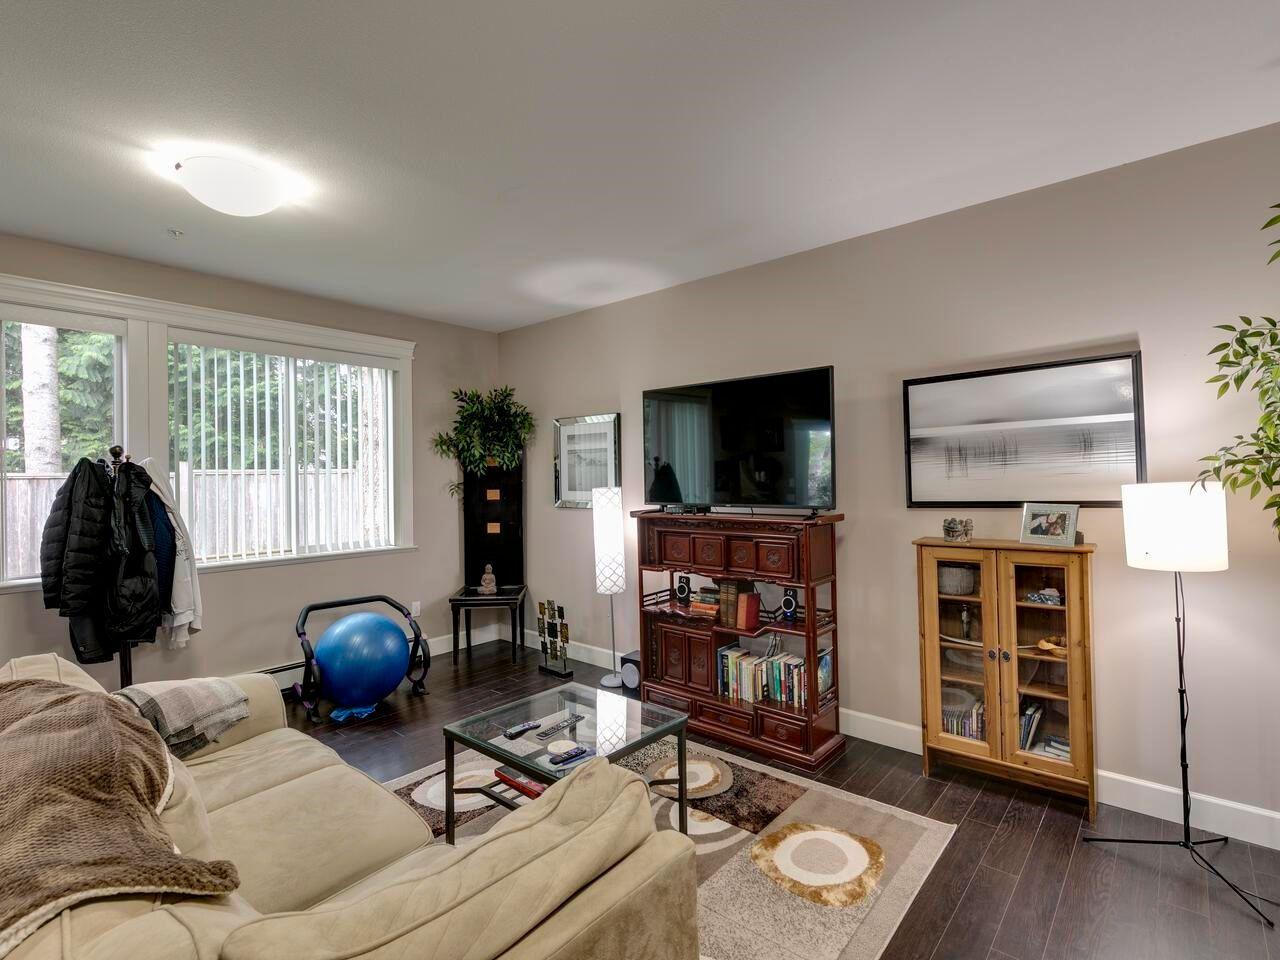 "Photo 23: Photos: 22845 126B Avenue in Maple Ridge: East Central House for sale in ""EAST CENTRAL MAPLE RIDGE"" : MLS®# R2594638"